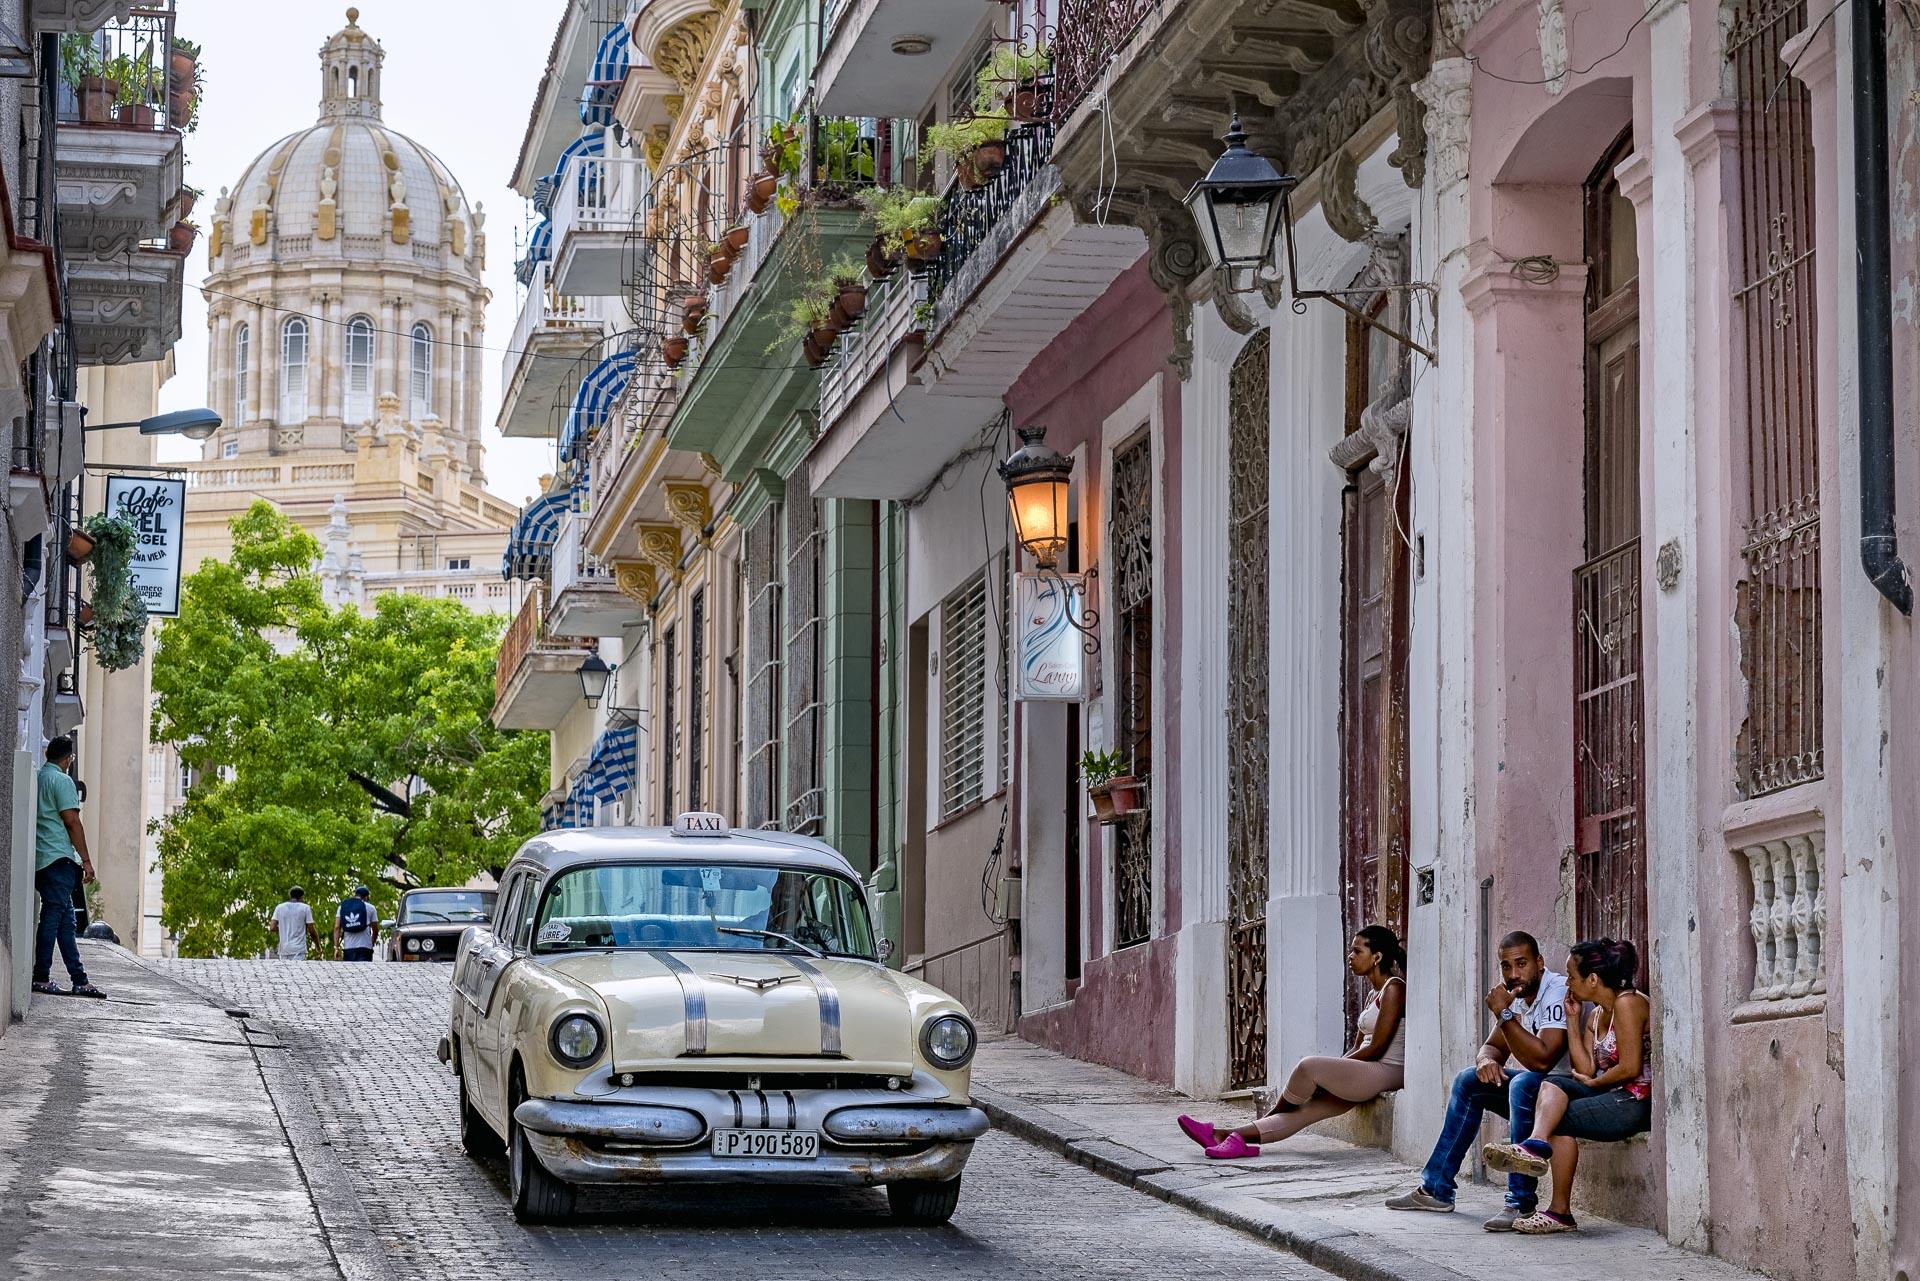 fotoreise-fotosafari-hd-2021-210-Kuba